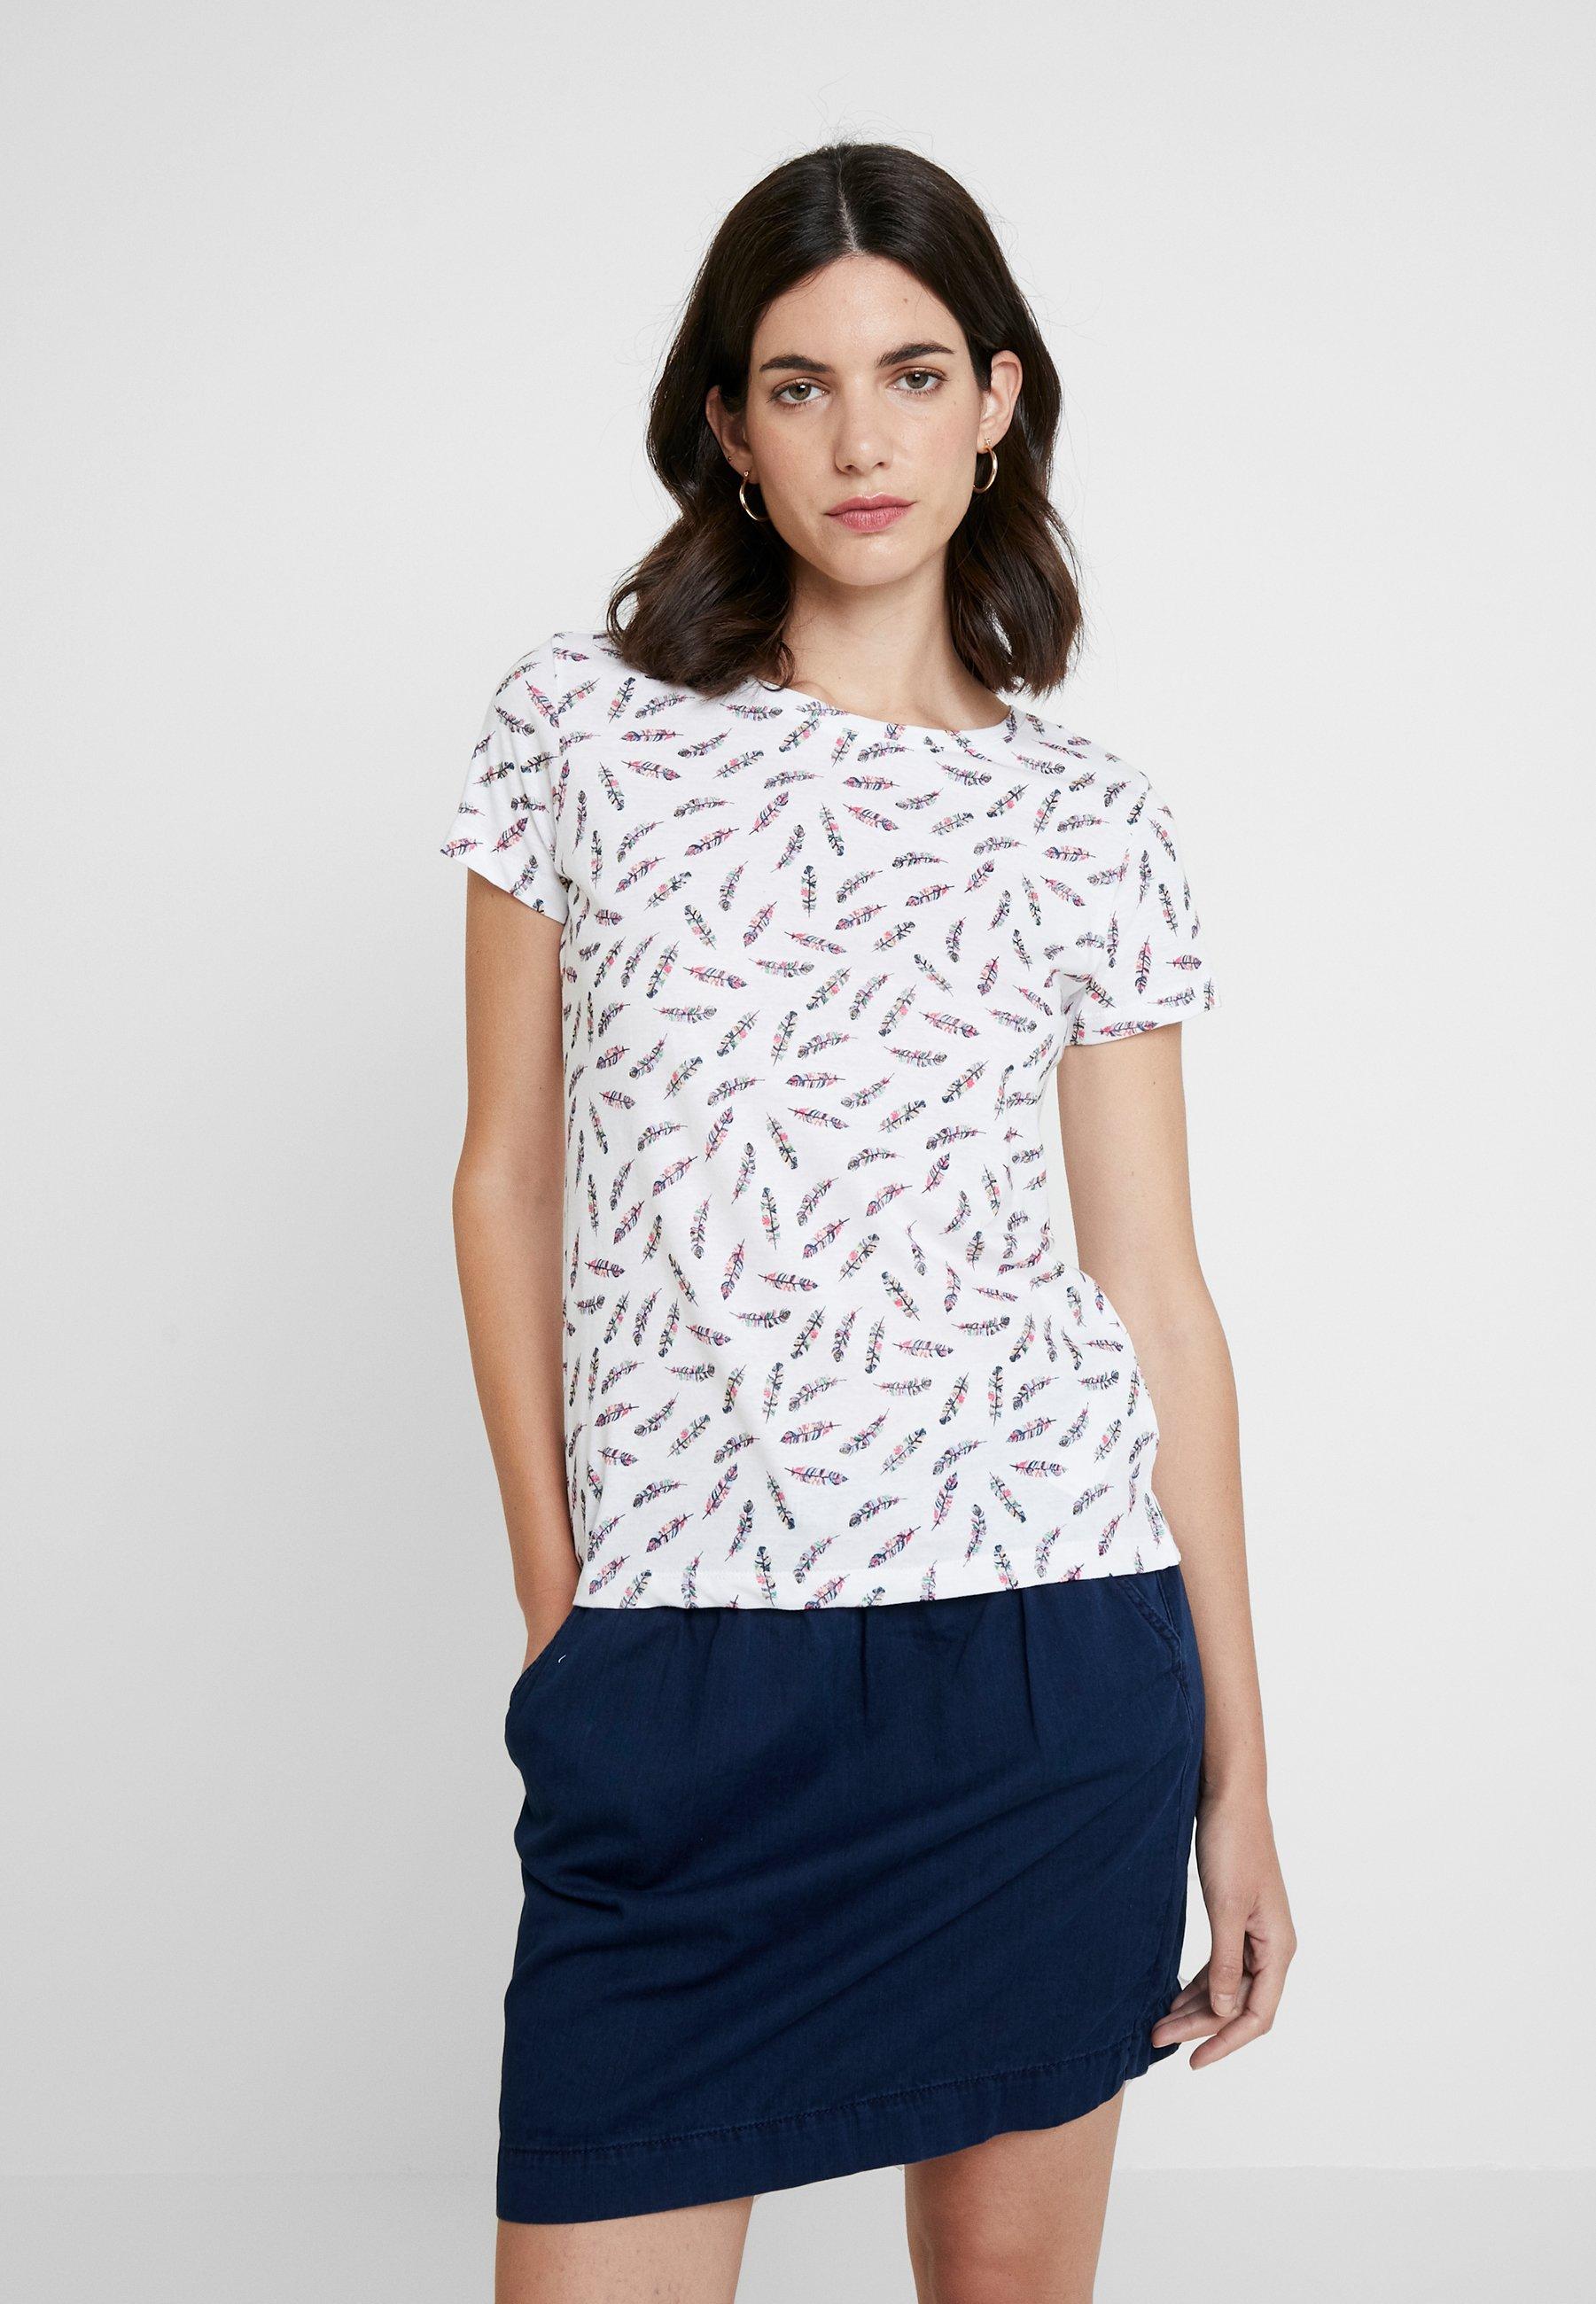 shirt SorbetT Imprimé Springfield White lF1K3TcJ